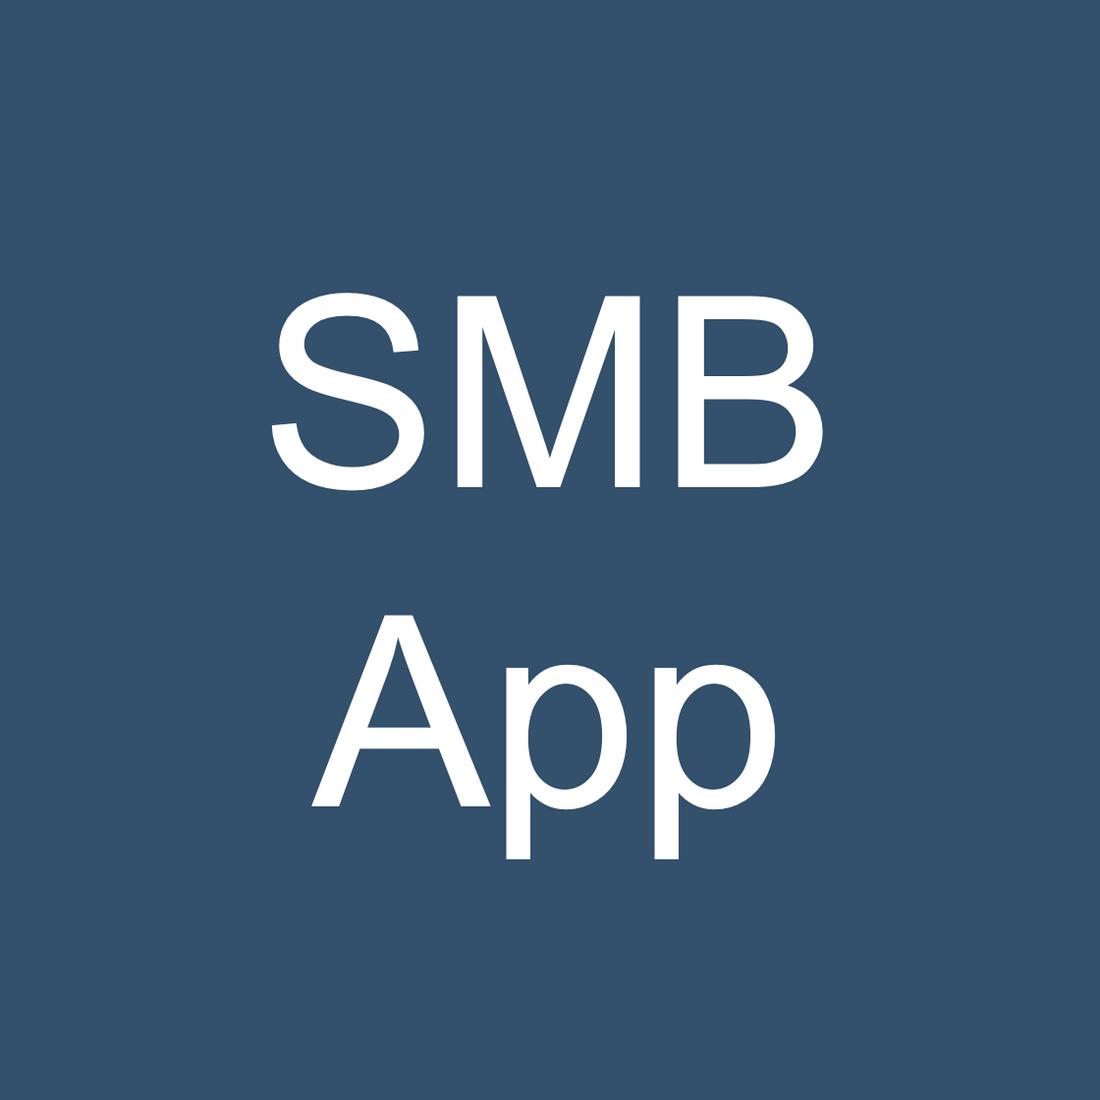 SMB App